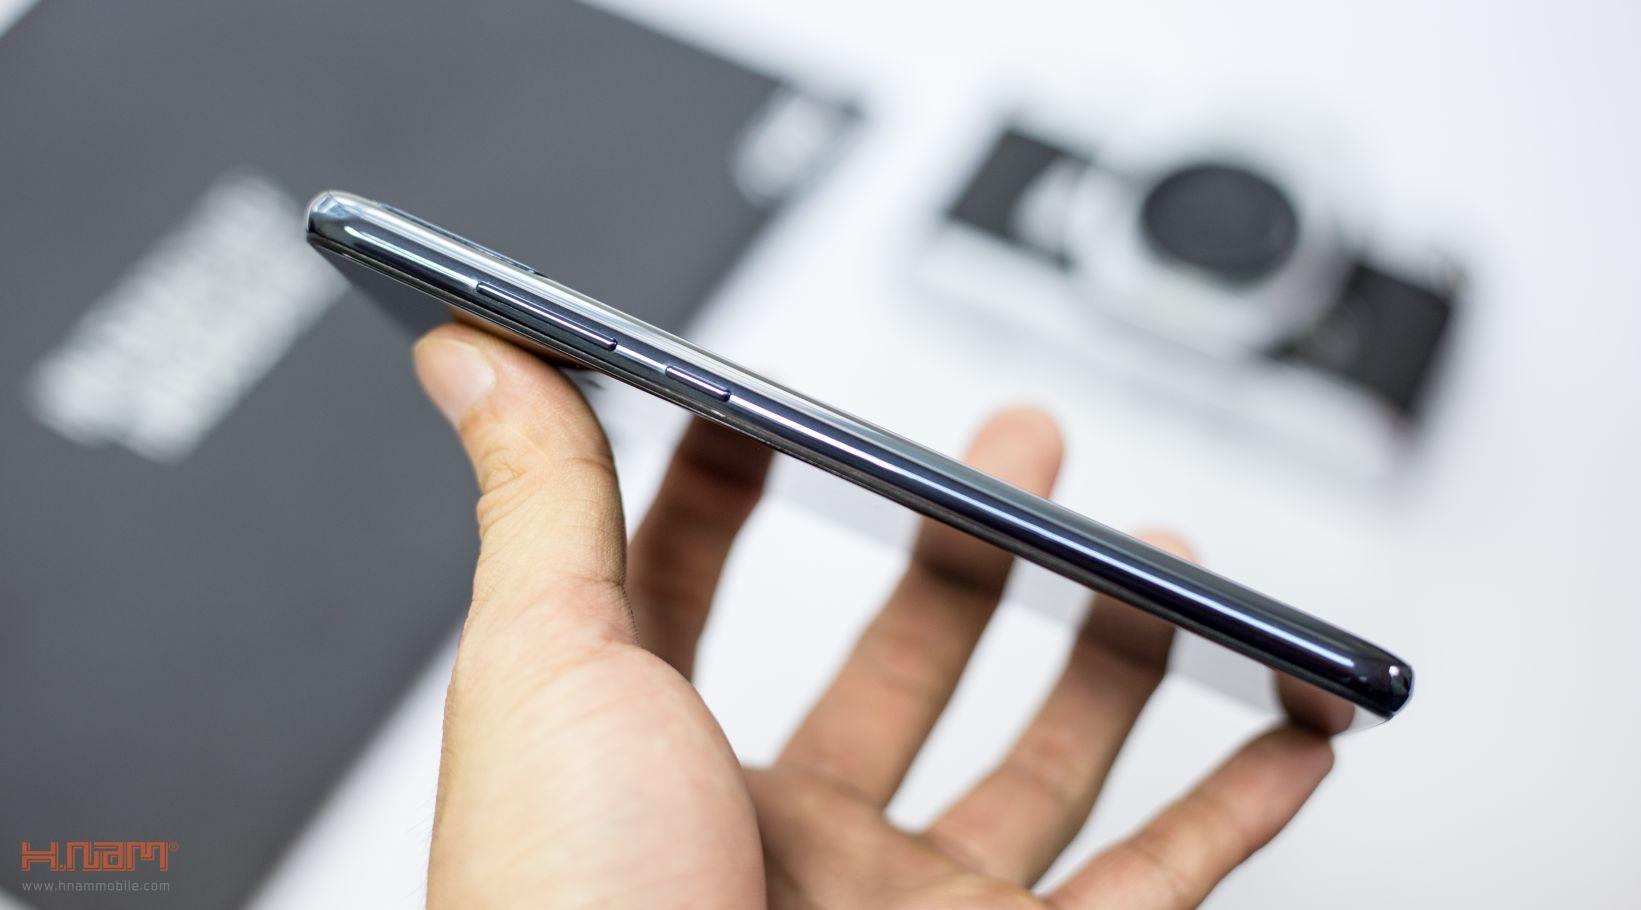 Trên tay Zenfone Max Pro M2: Snapdragon 660, pin 5000mAh, 5.29 triệu hình 4